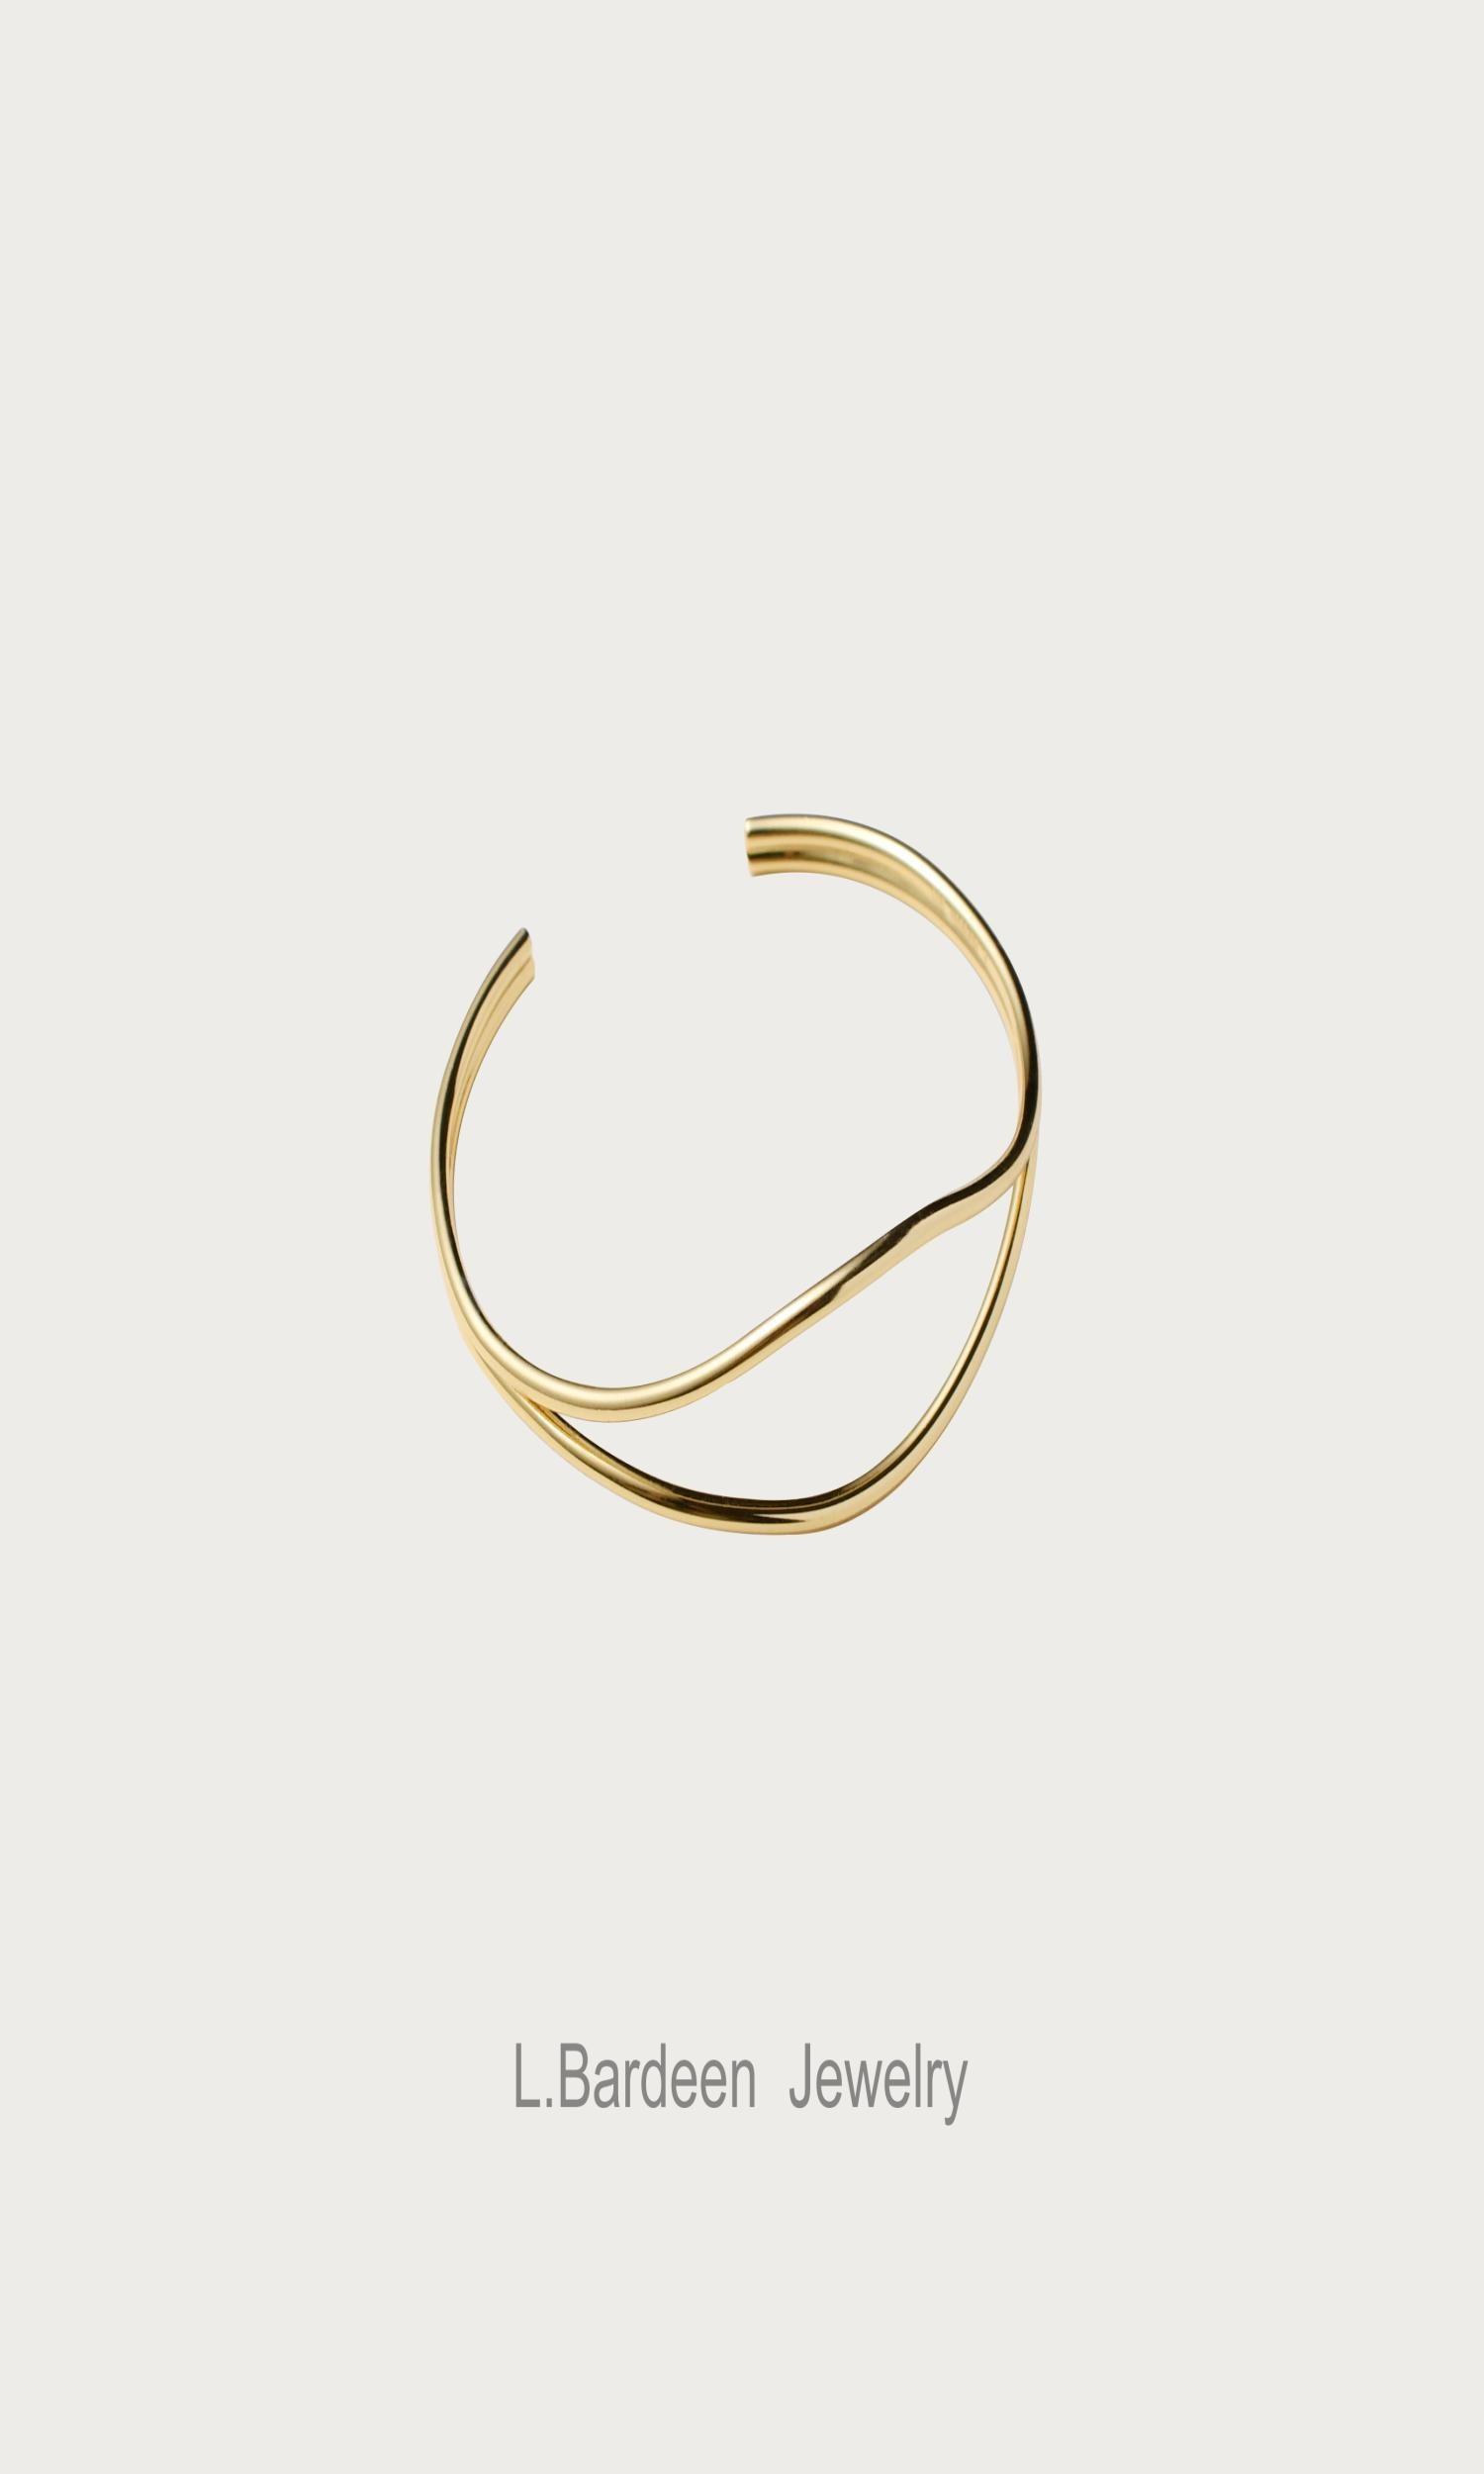 High grade L. Bardeen pure silver bracelet simple Bracelet Gold temperament retro geometry original niche design